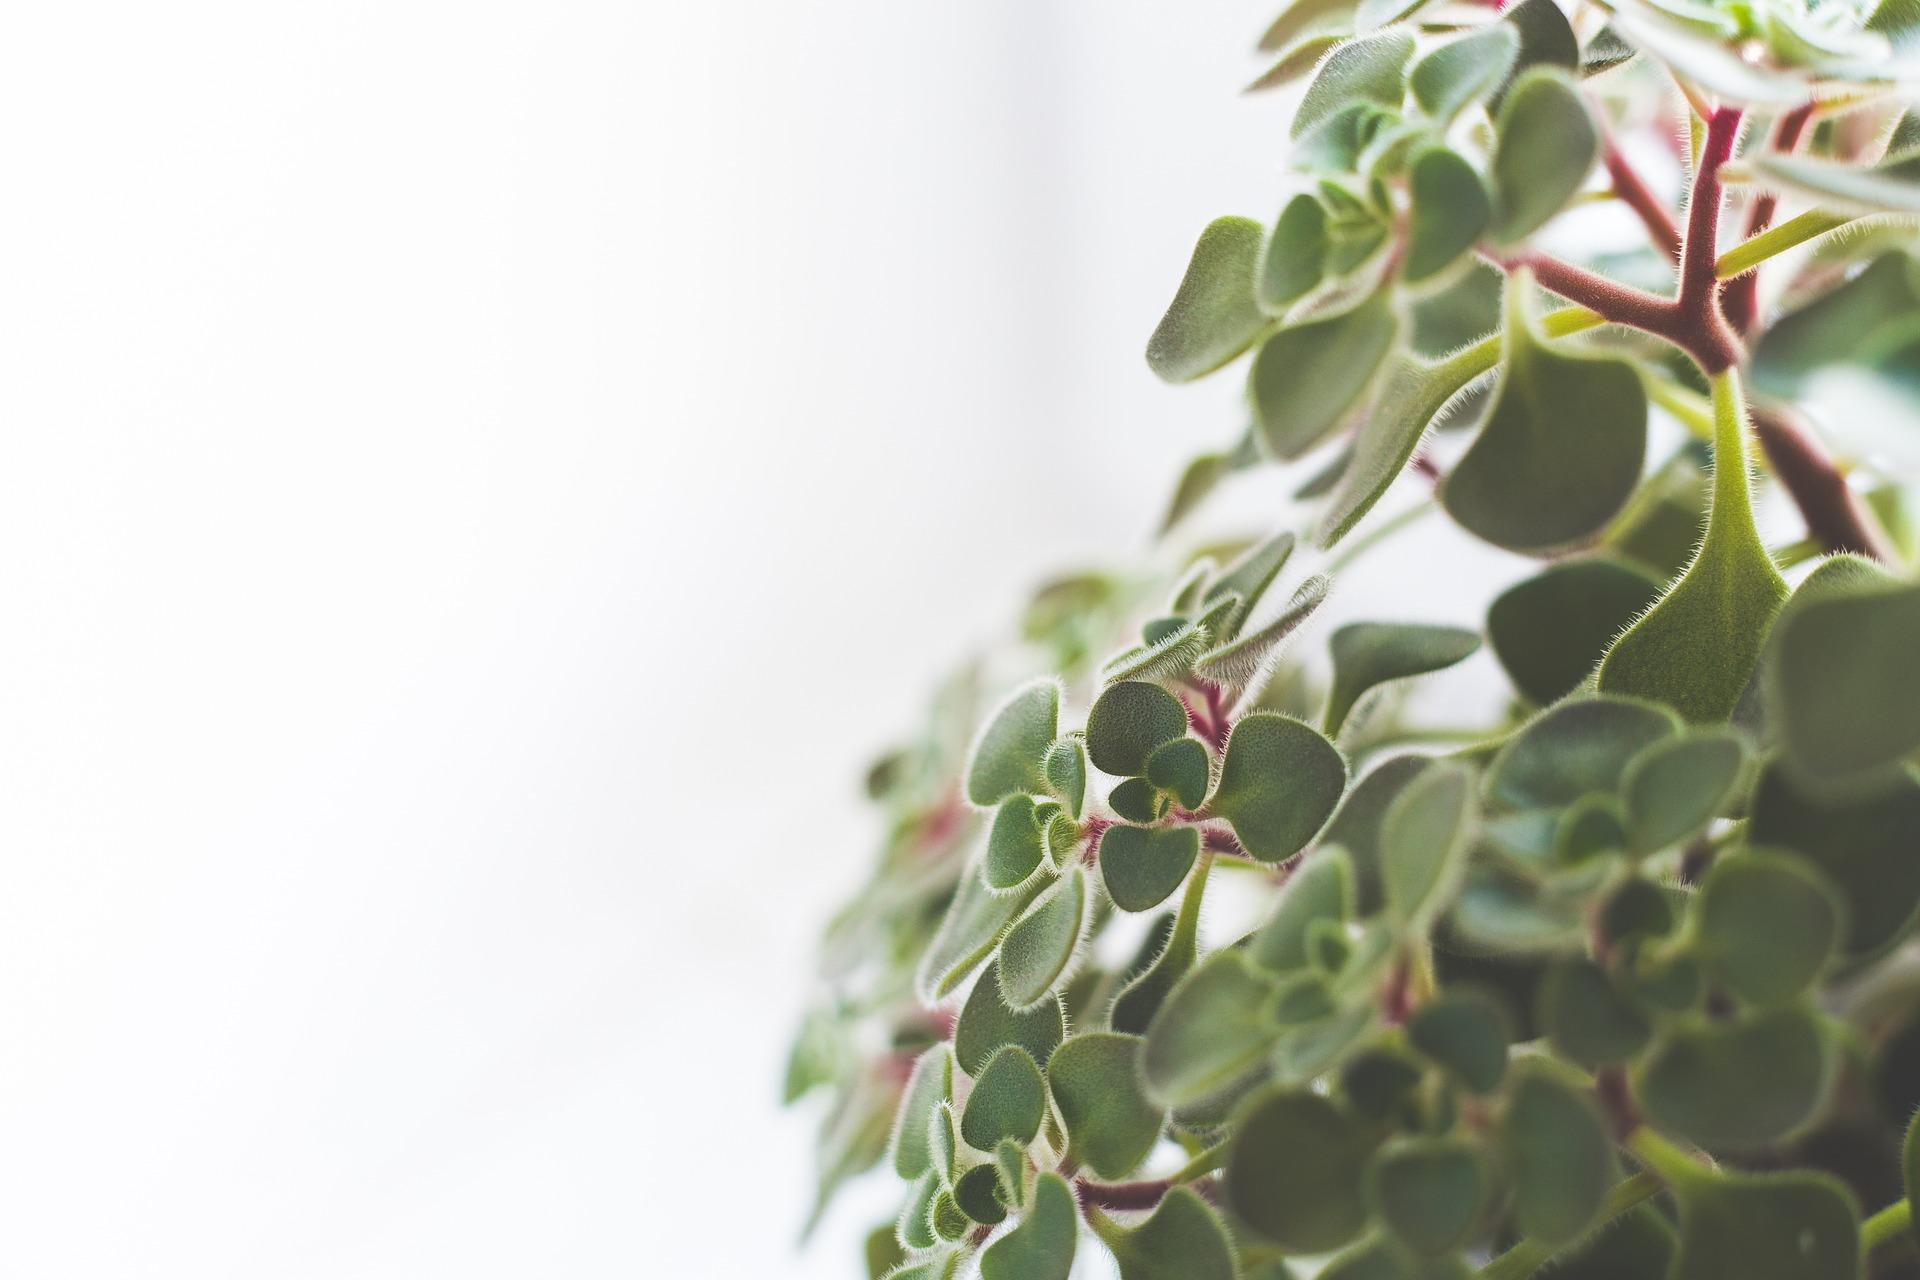 houseplants-791120_1920.jpg